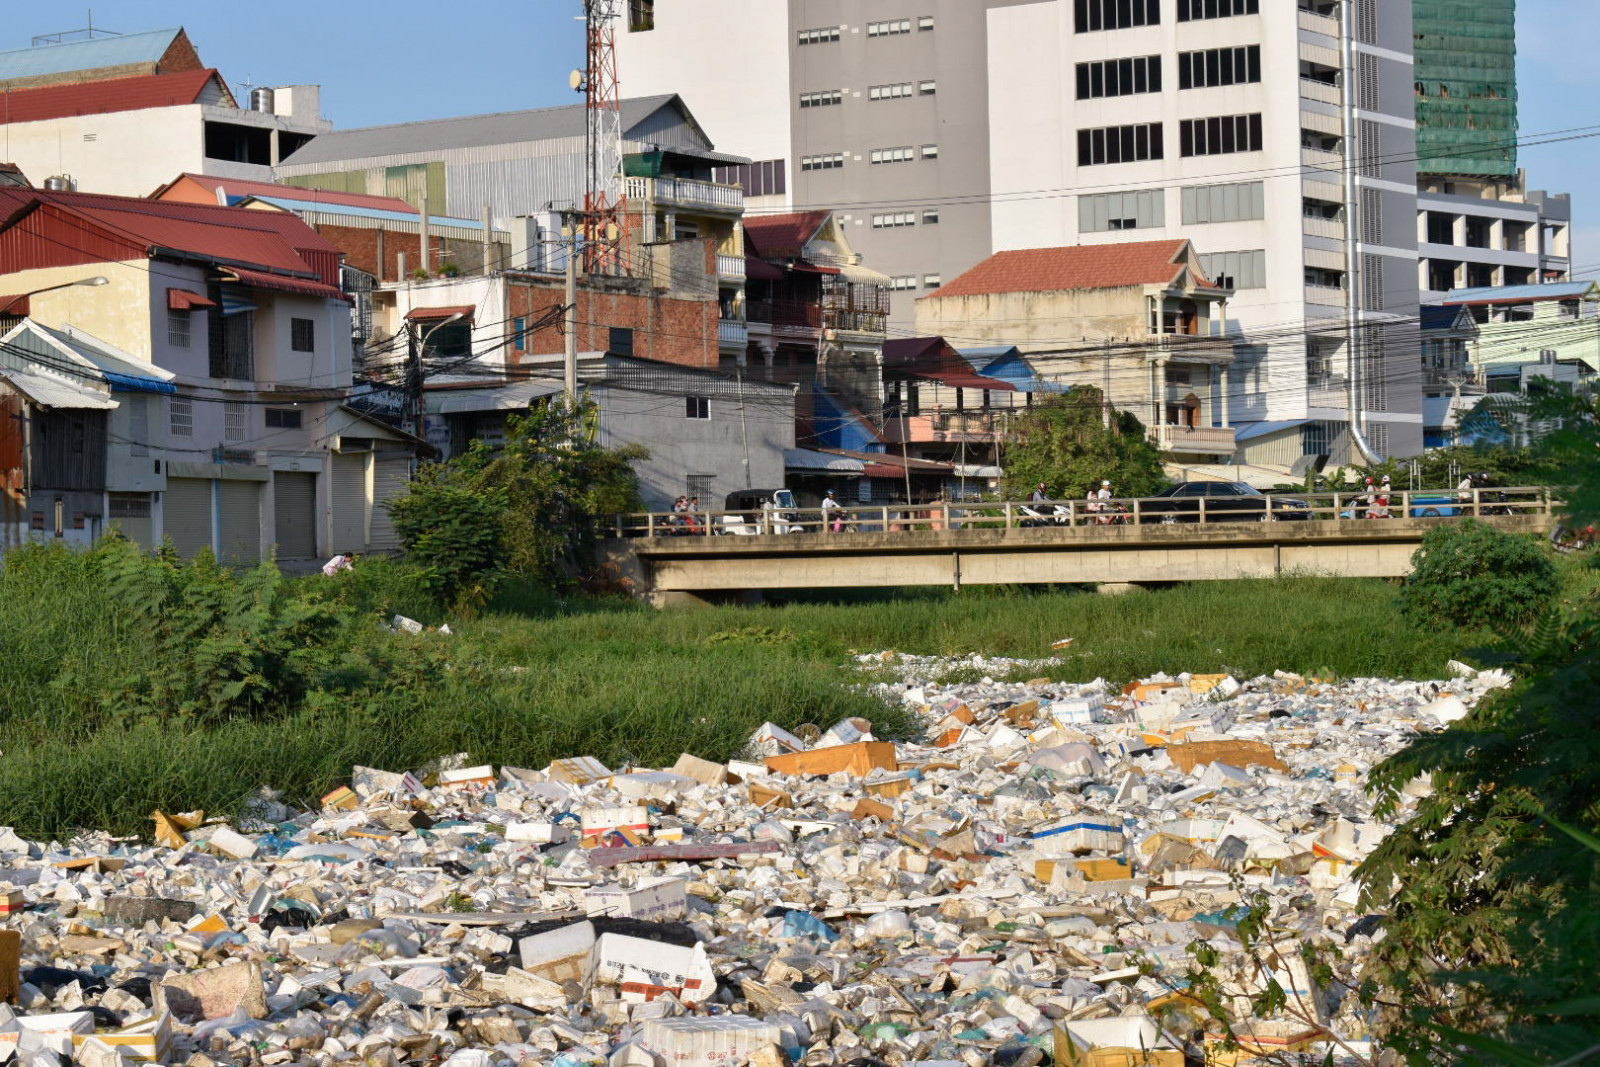 City of garbage Phnom Penh rivers of garbage